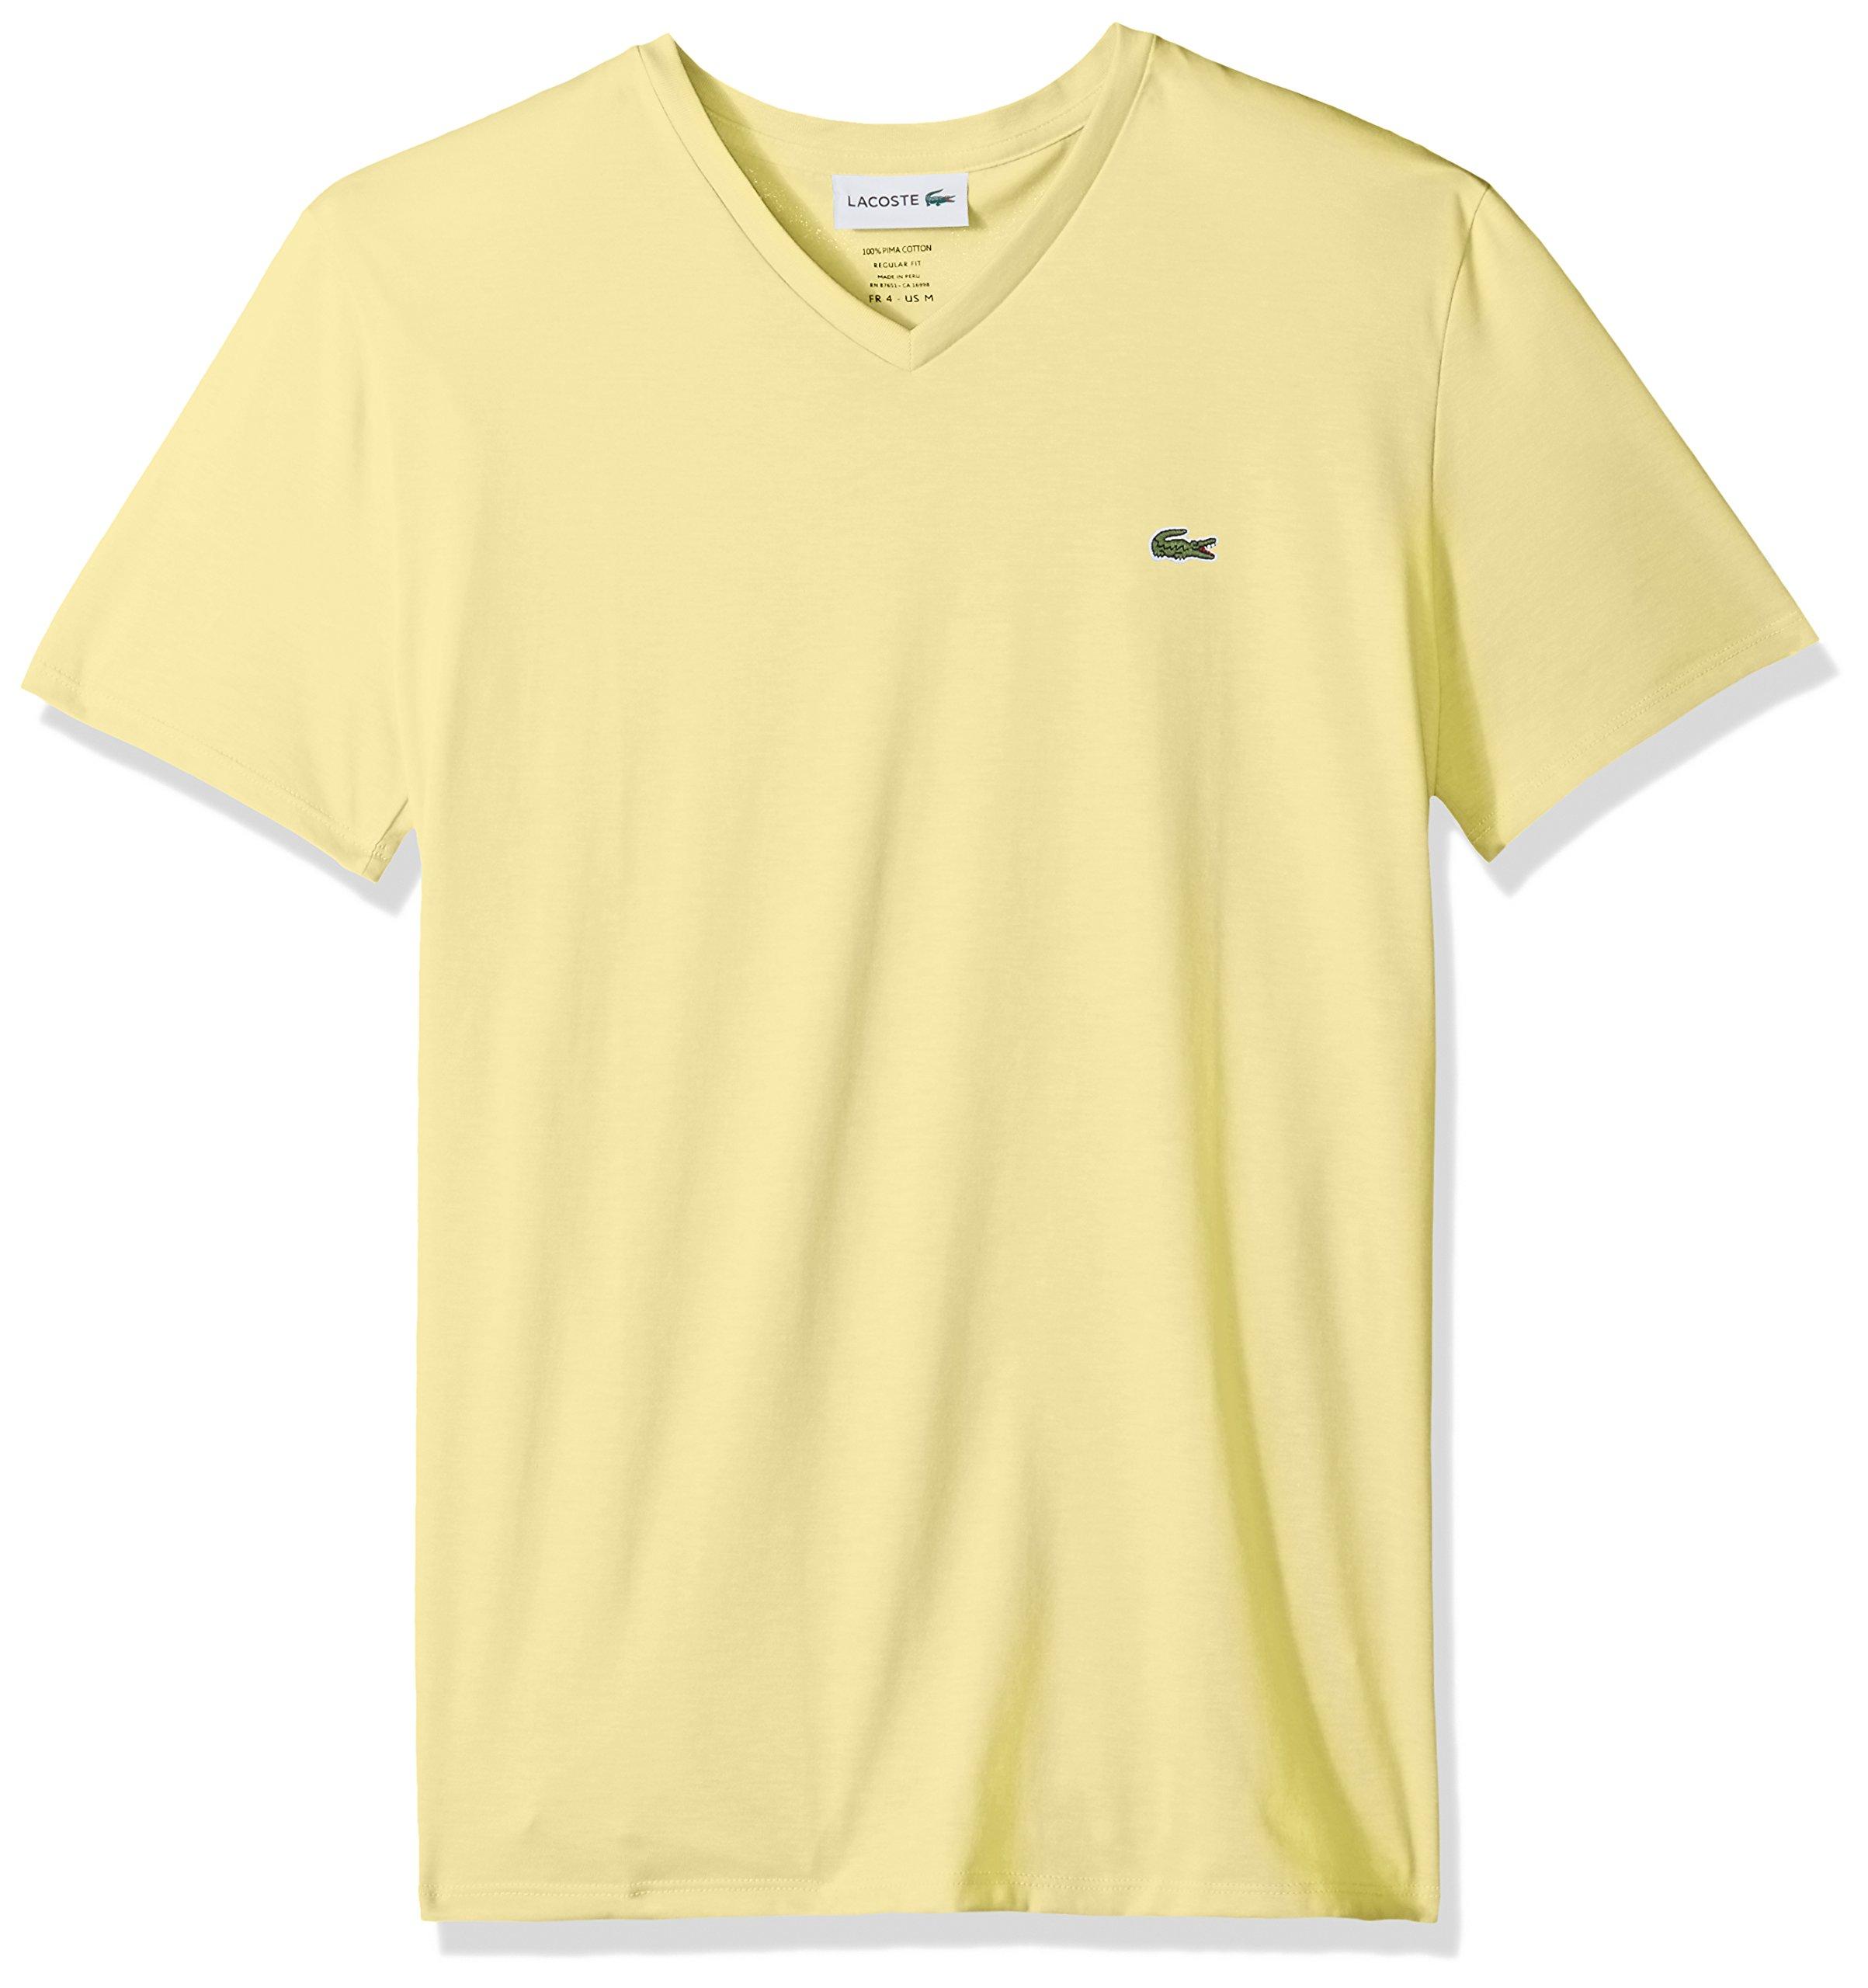 c30d4b2f Galleon - Lacoste Men's Short Sleeve V Neck Pima Jersey T-Shirt, TH6710,  Yellow, 4X-Large